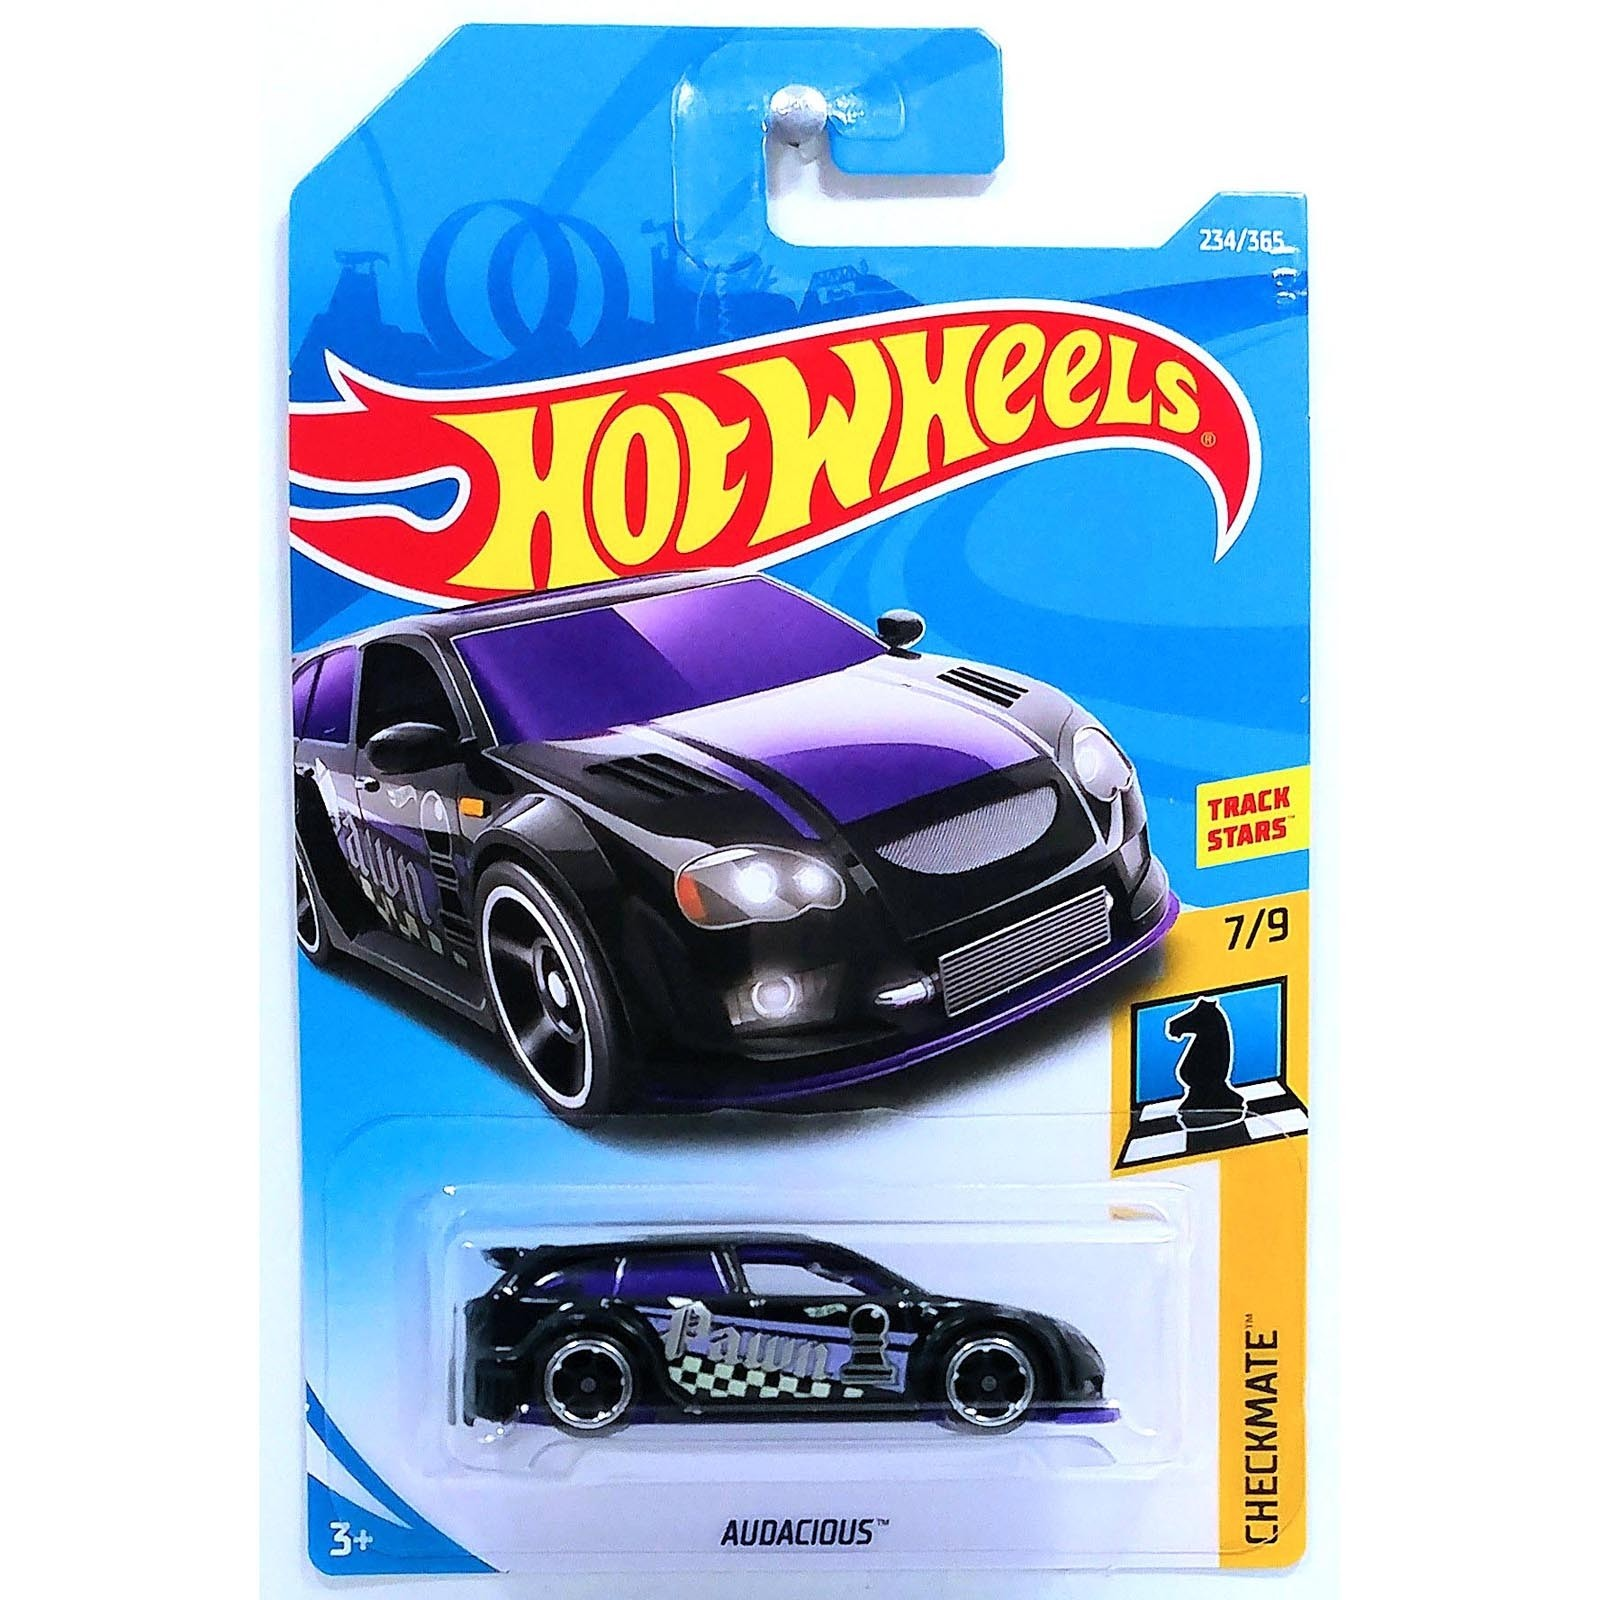 Hot Wheels - Audacious - FJX61